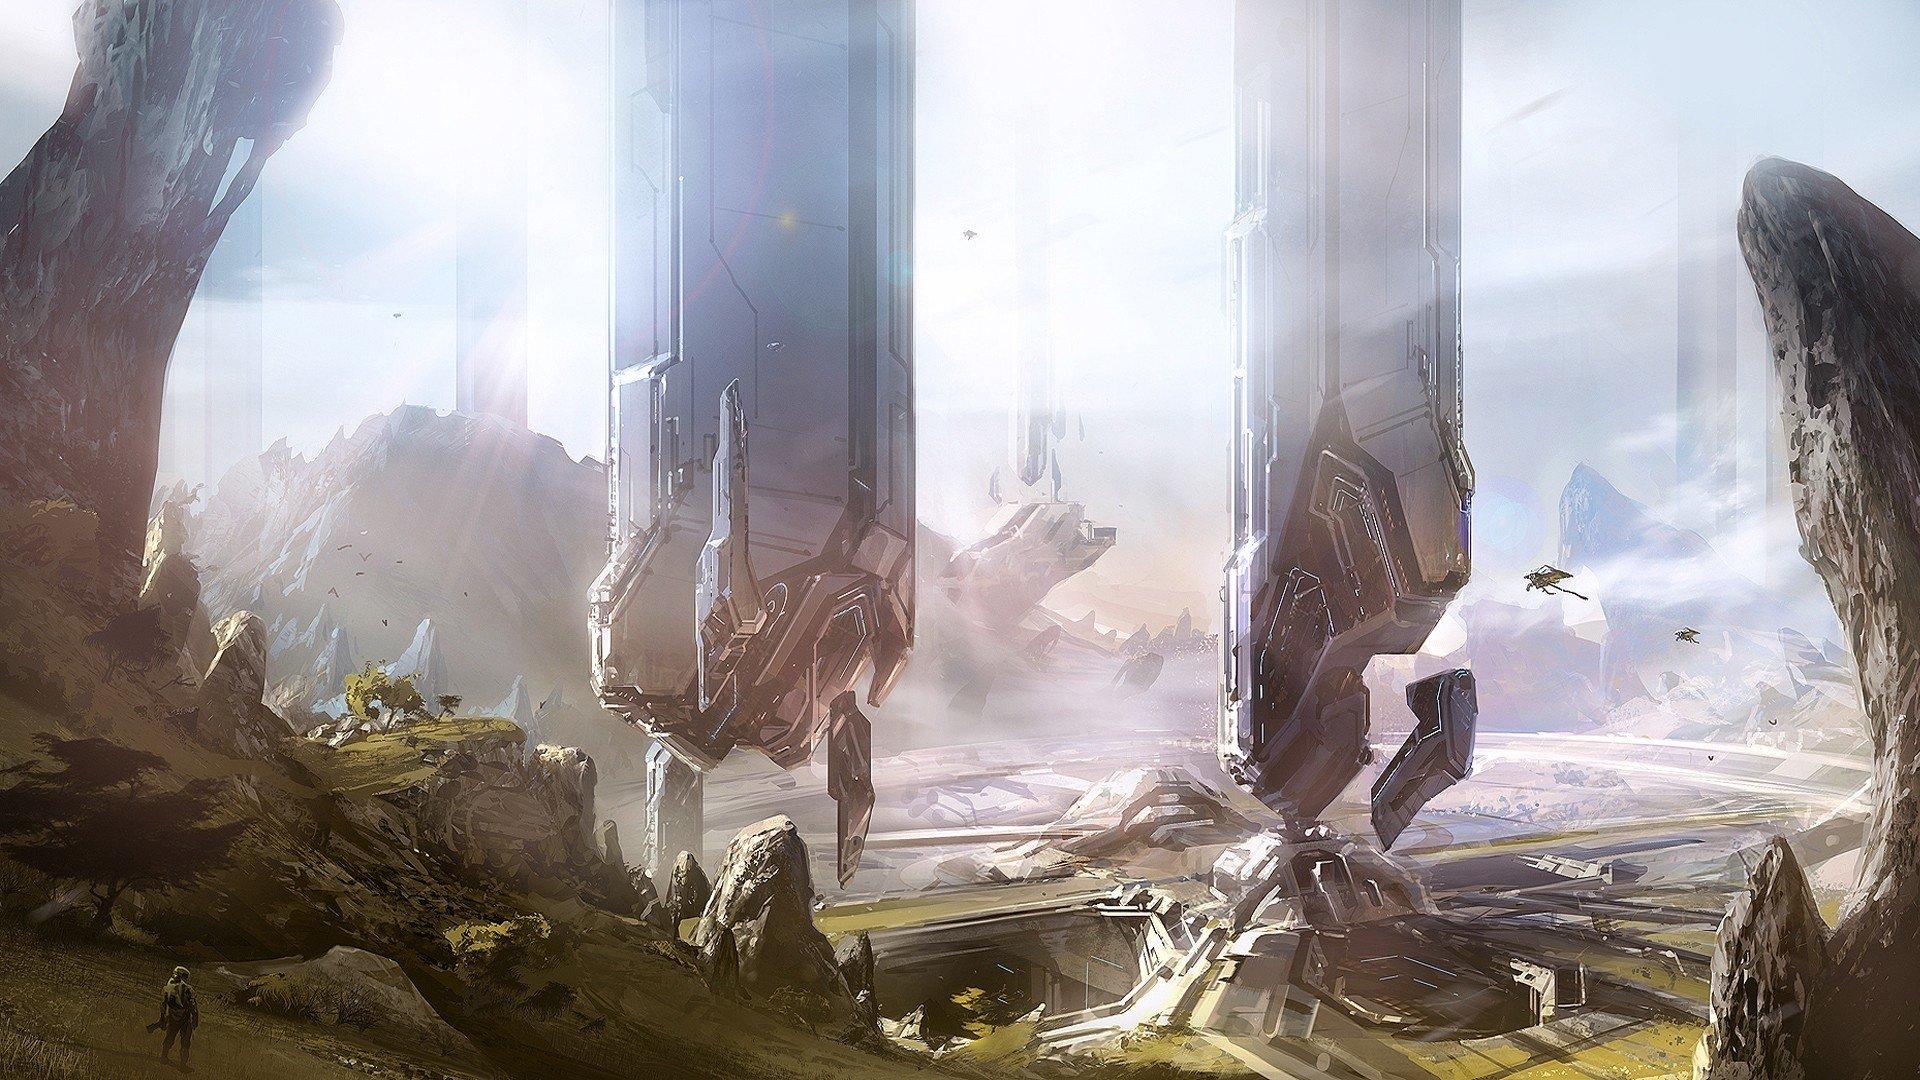 Video Oyunu - Halo 4  Halo Floating Island Manzara Floating Sanat Eseri Duvarkağıdı